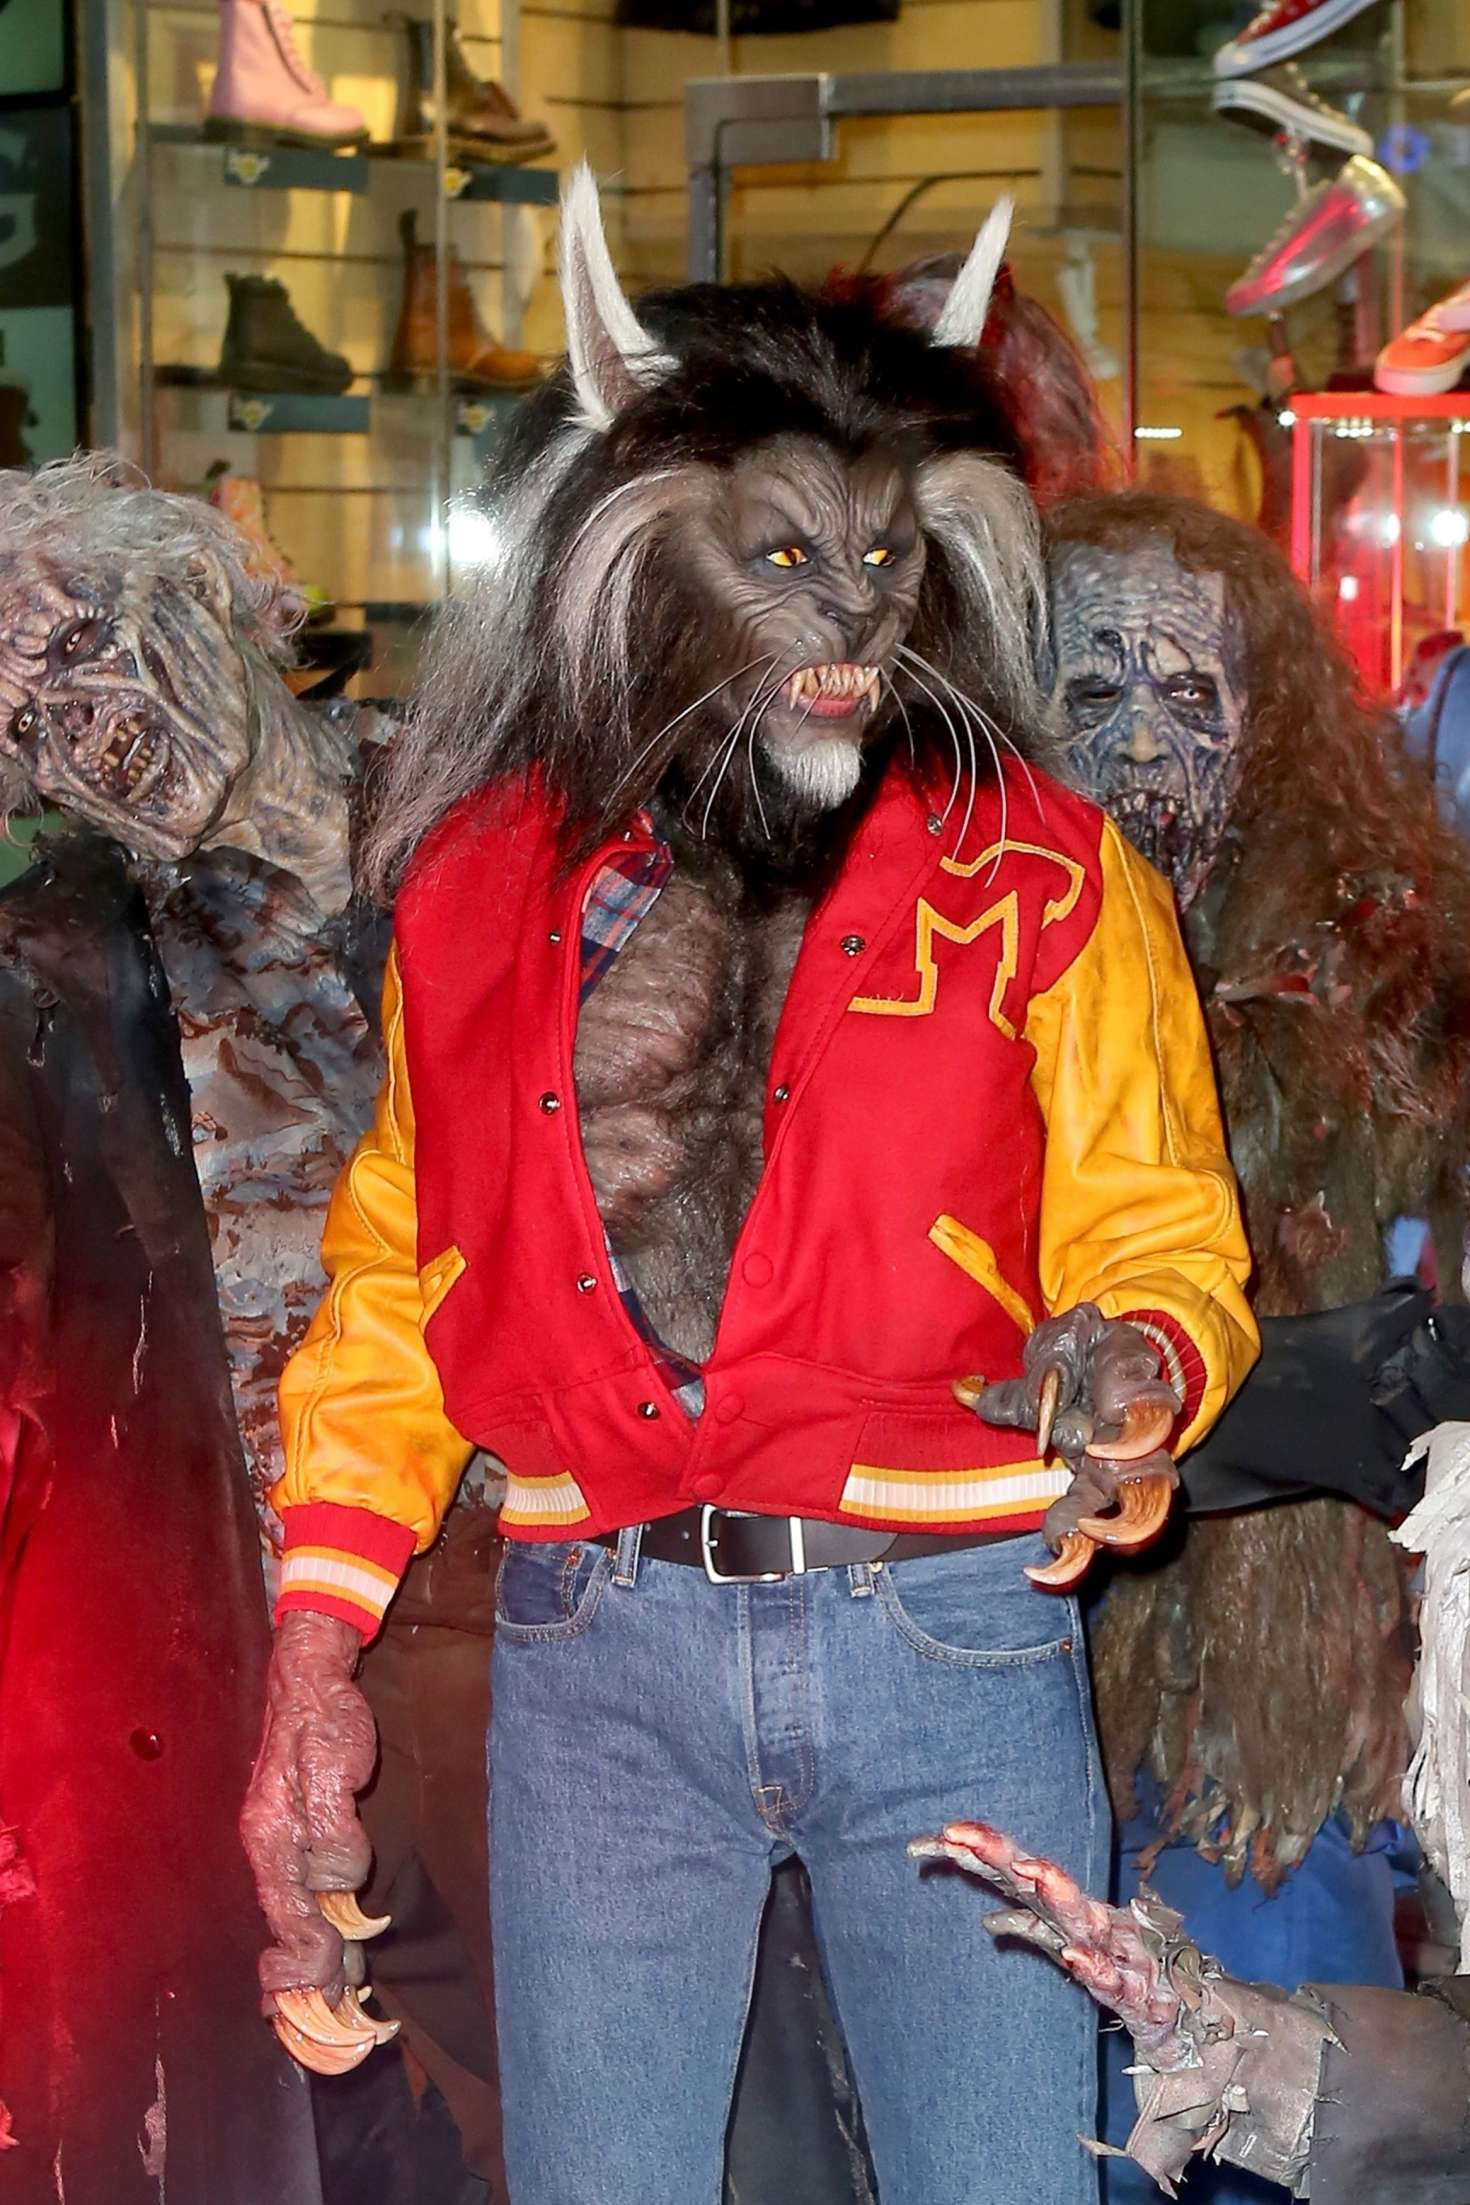 Heidi Klum - Dresses as nerd Scott Howard from Teen Wolf at her annual Halloween Bash in NY